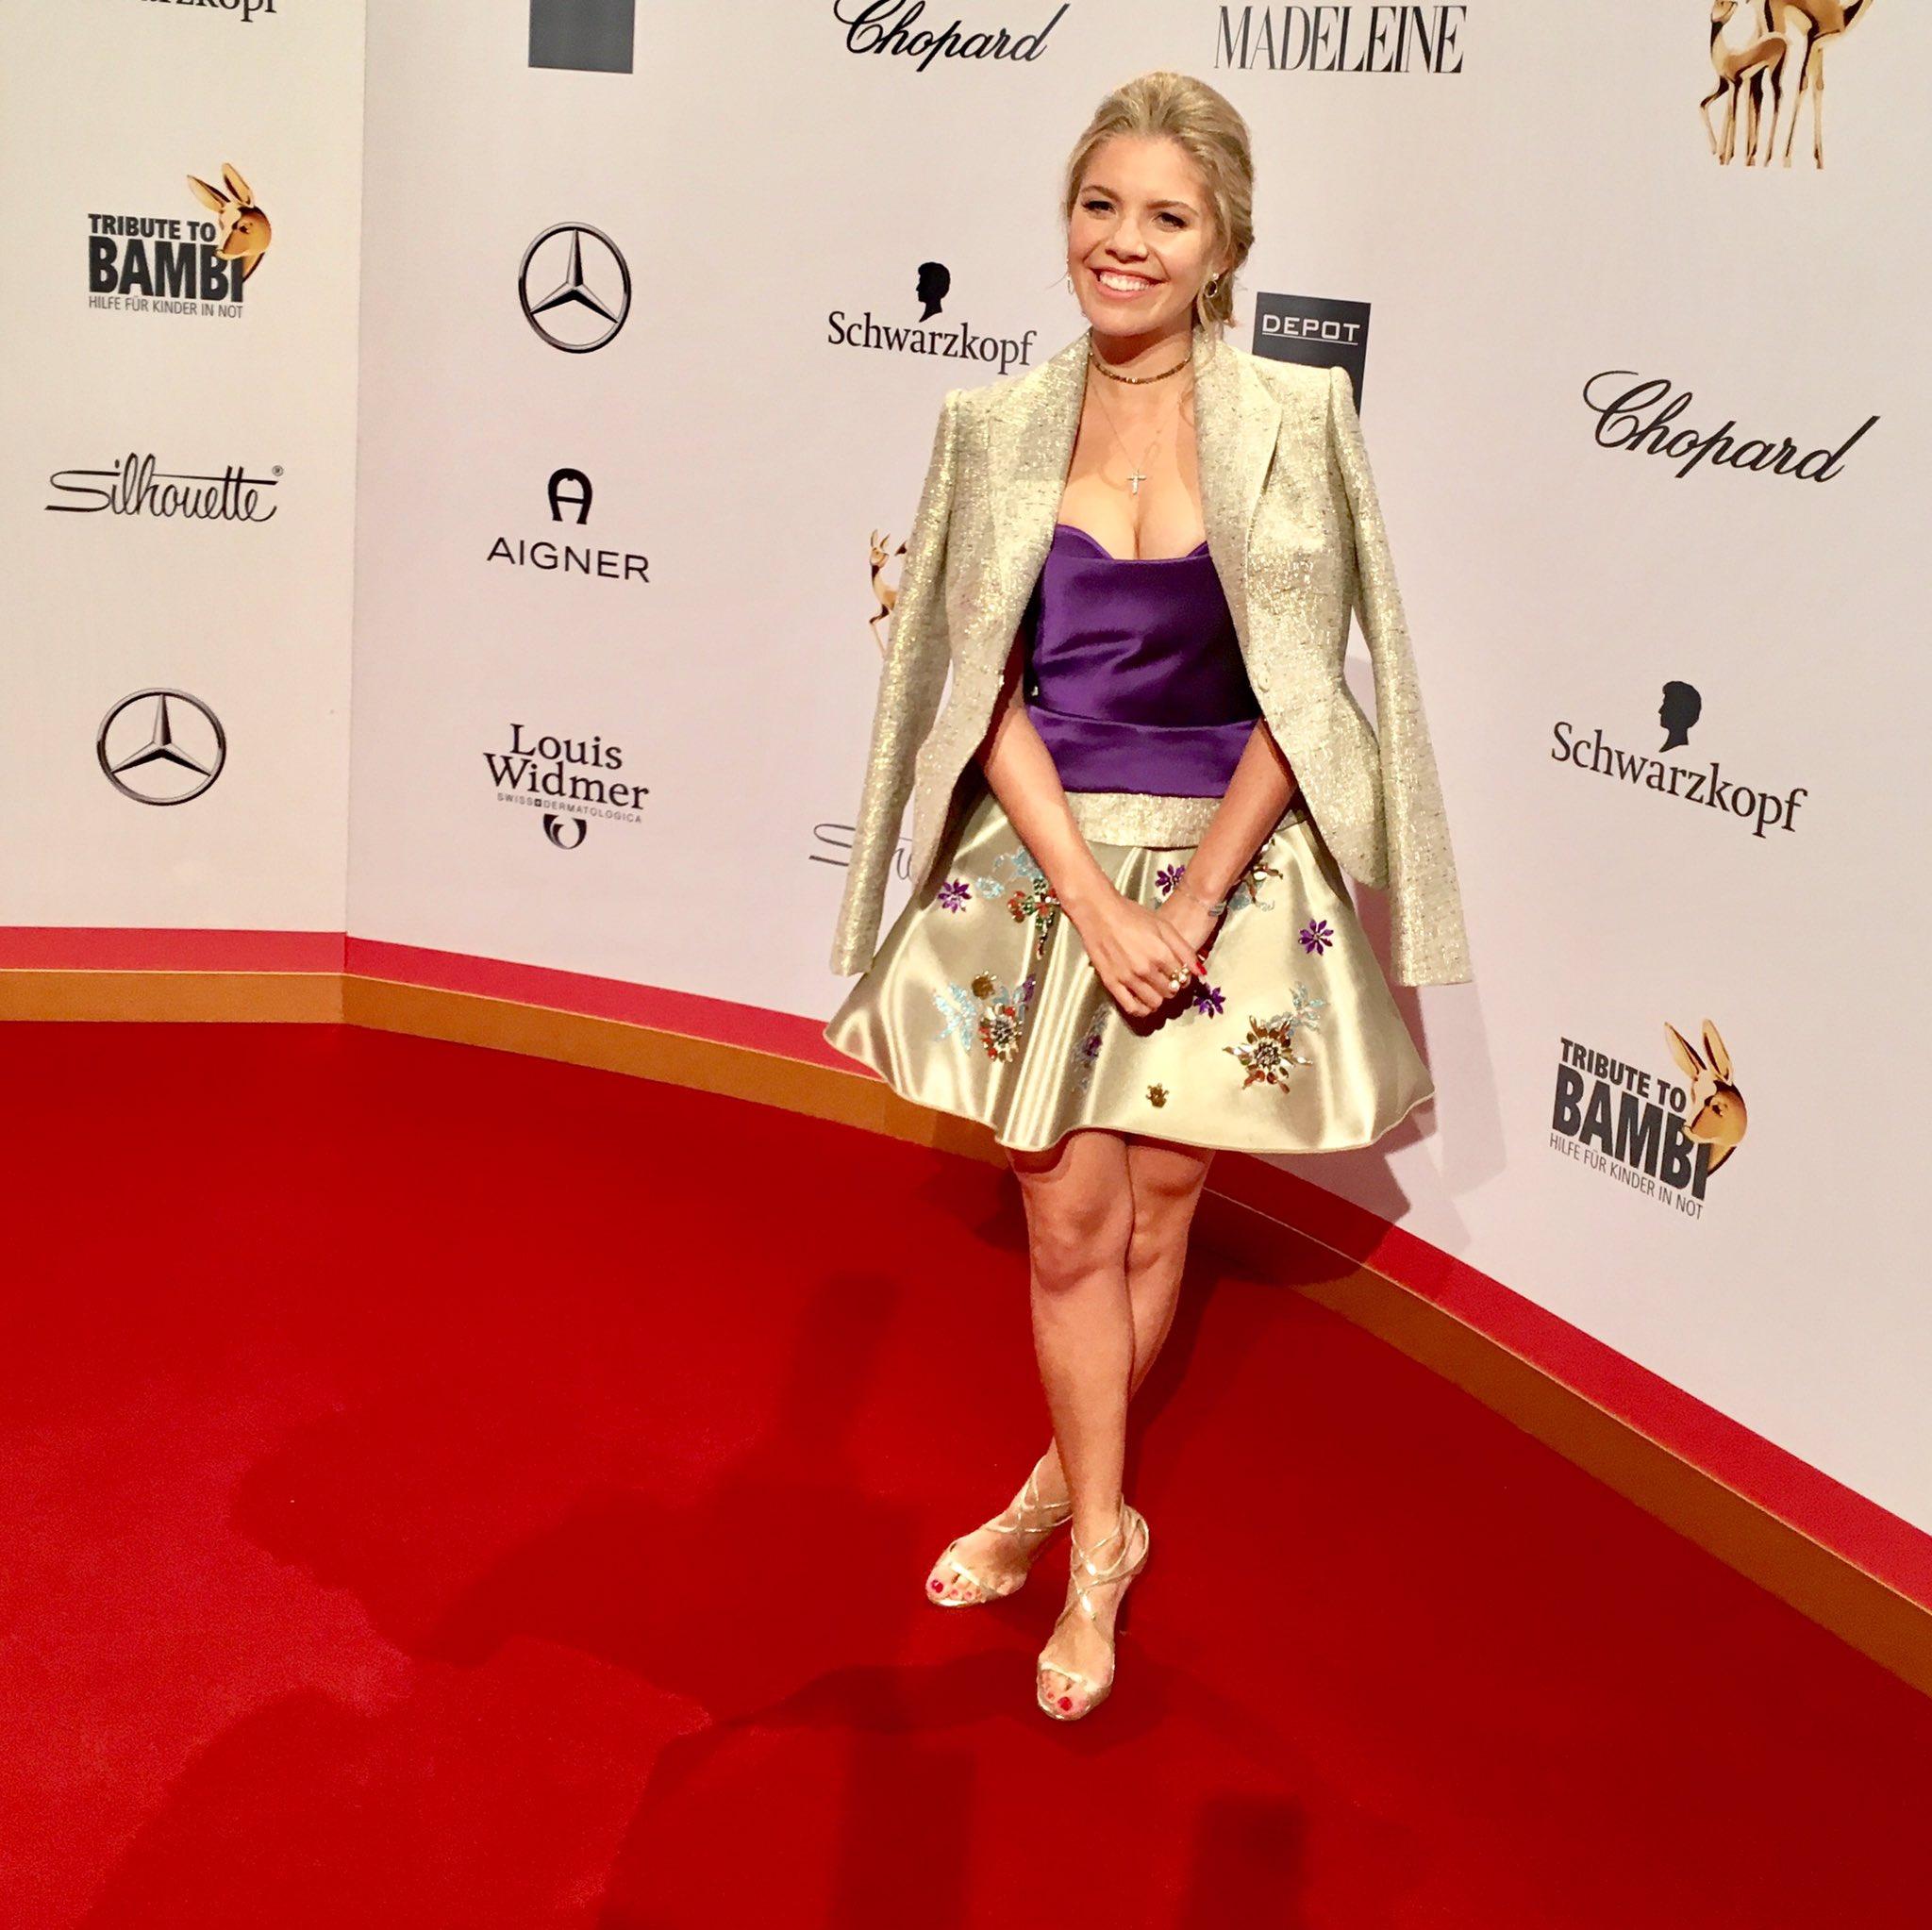 Victoria Swarovski Supertalent Outfit